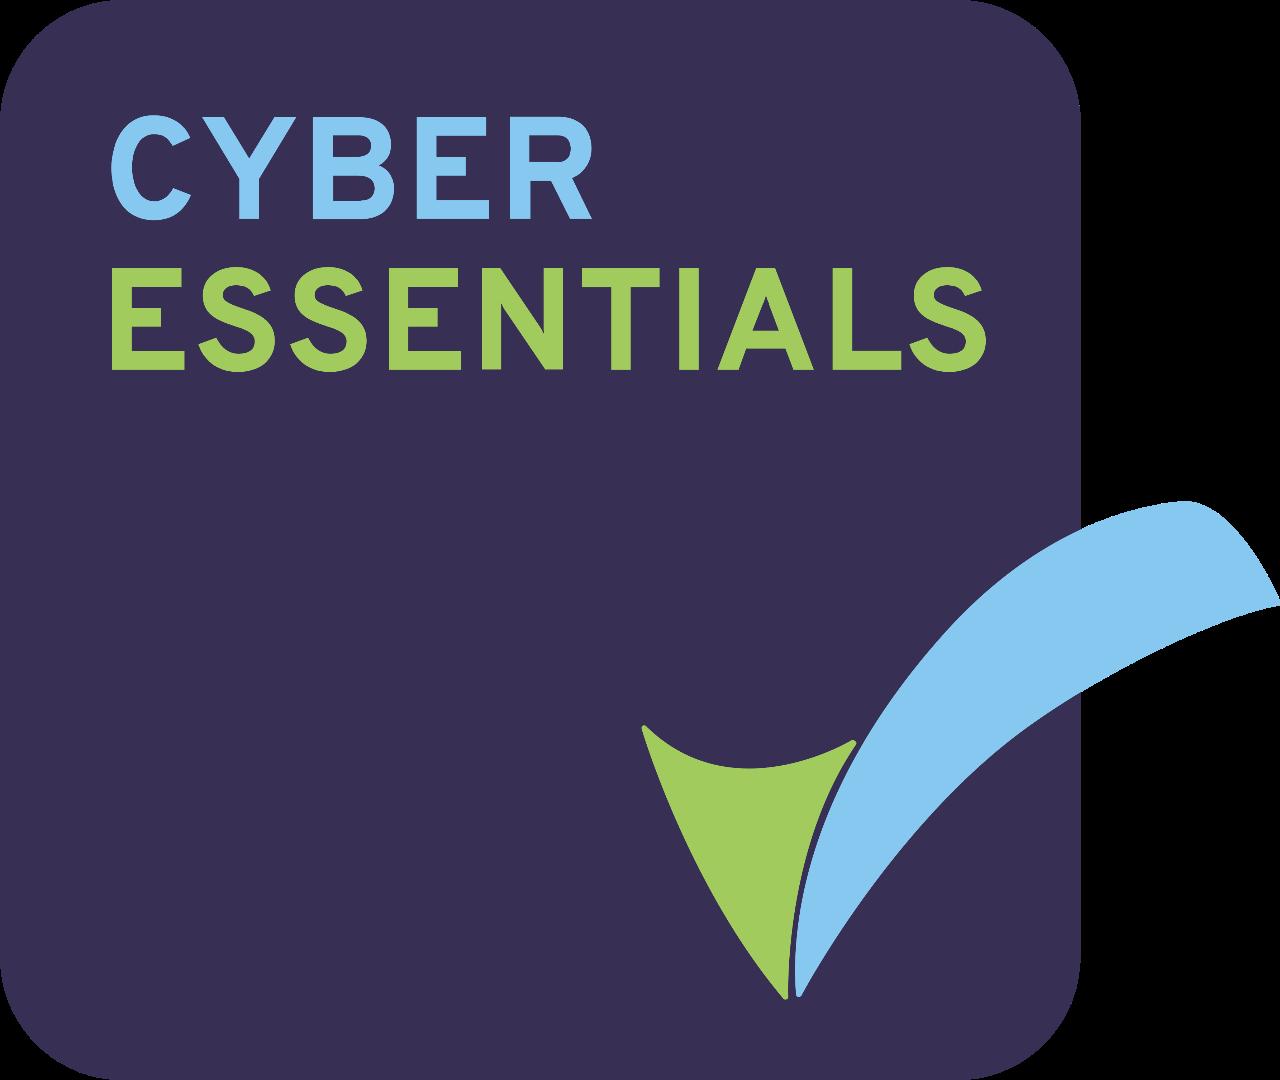 cyber-essentials-logo-huge.png